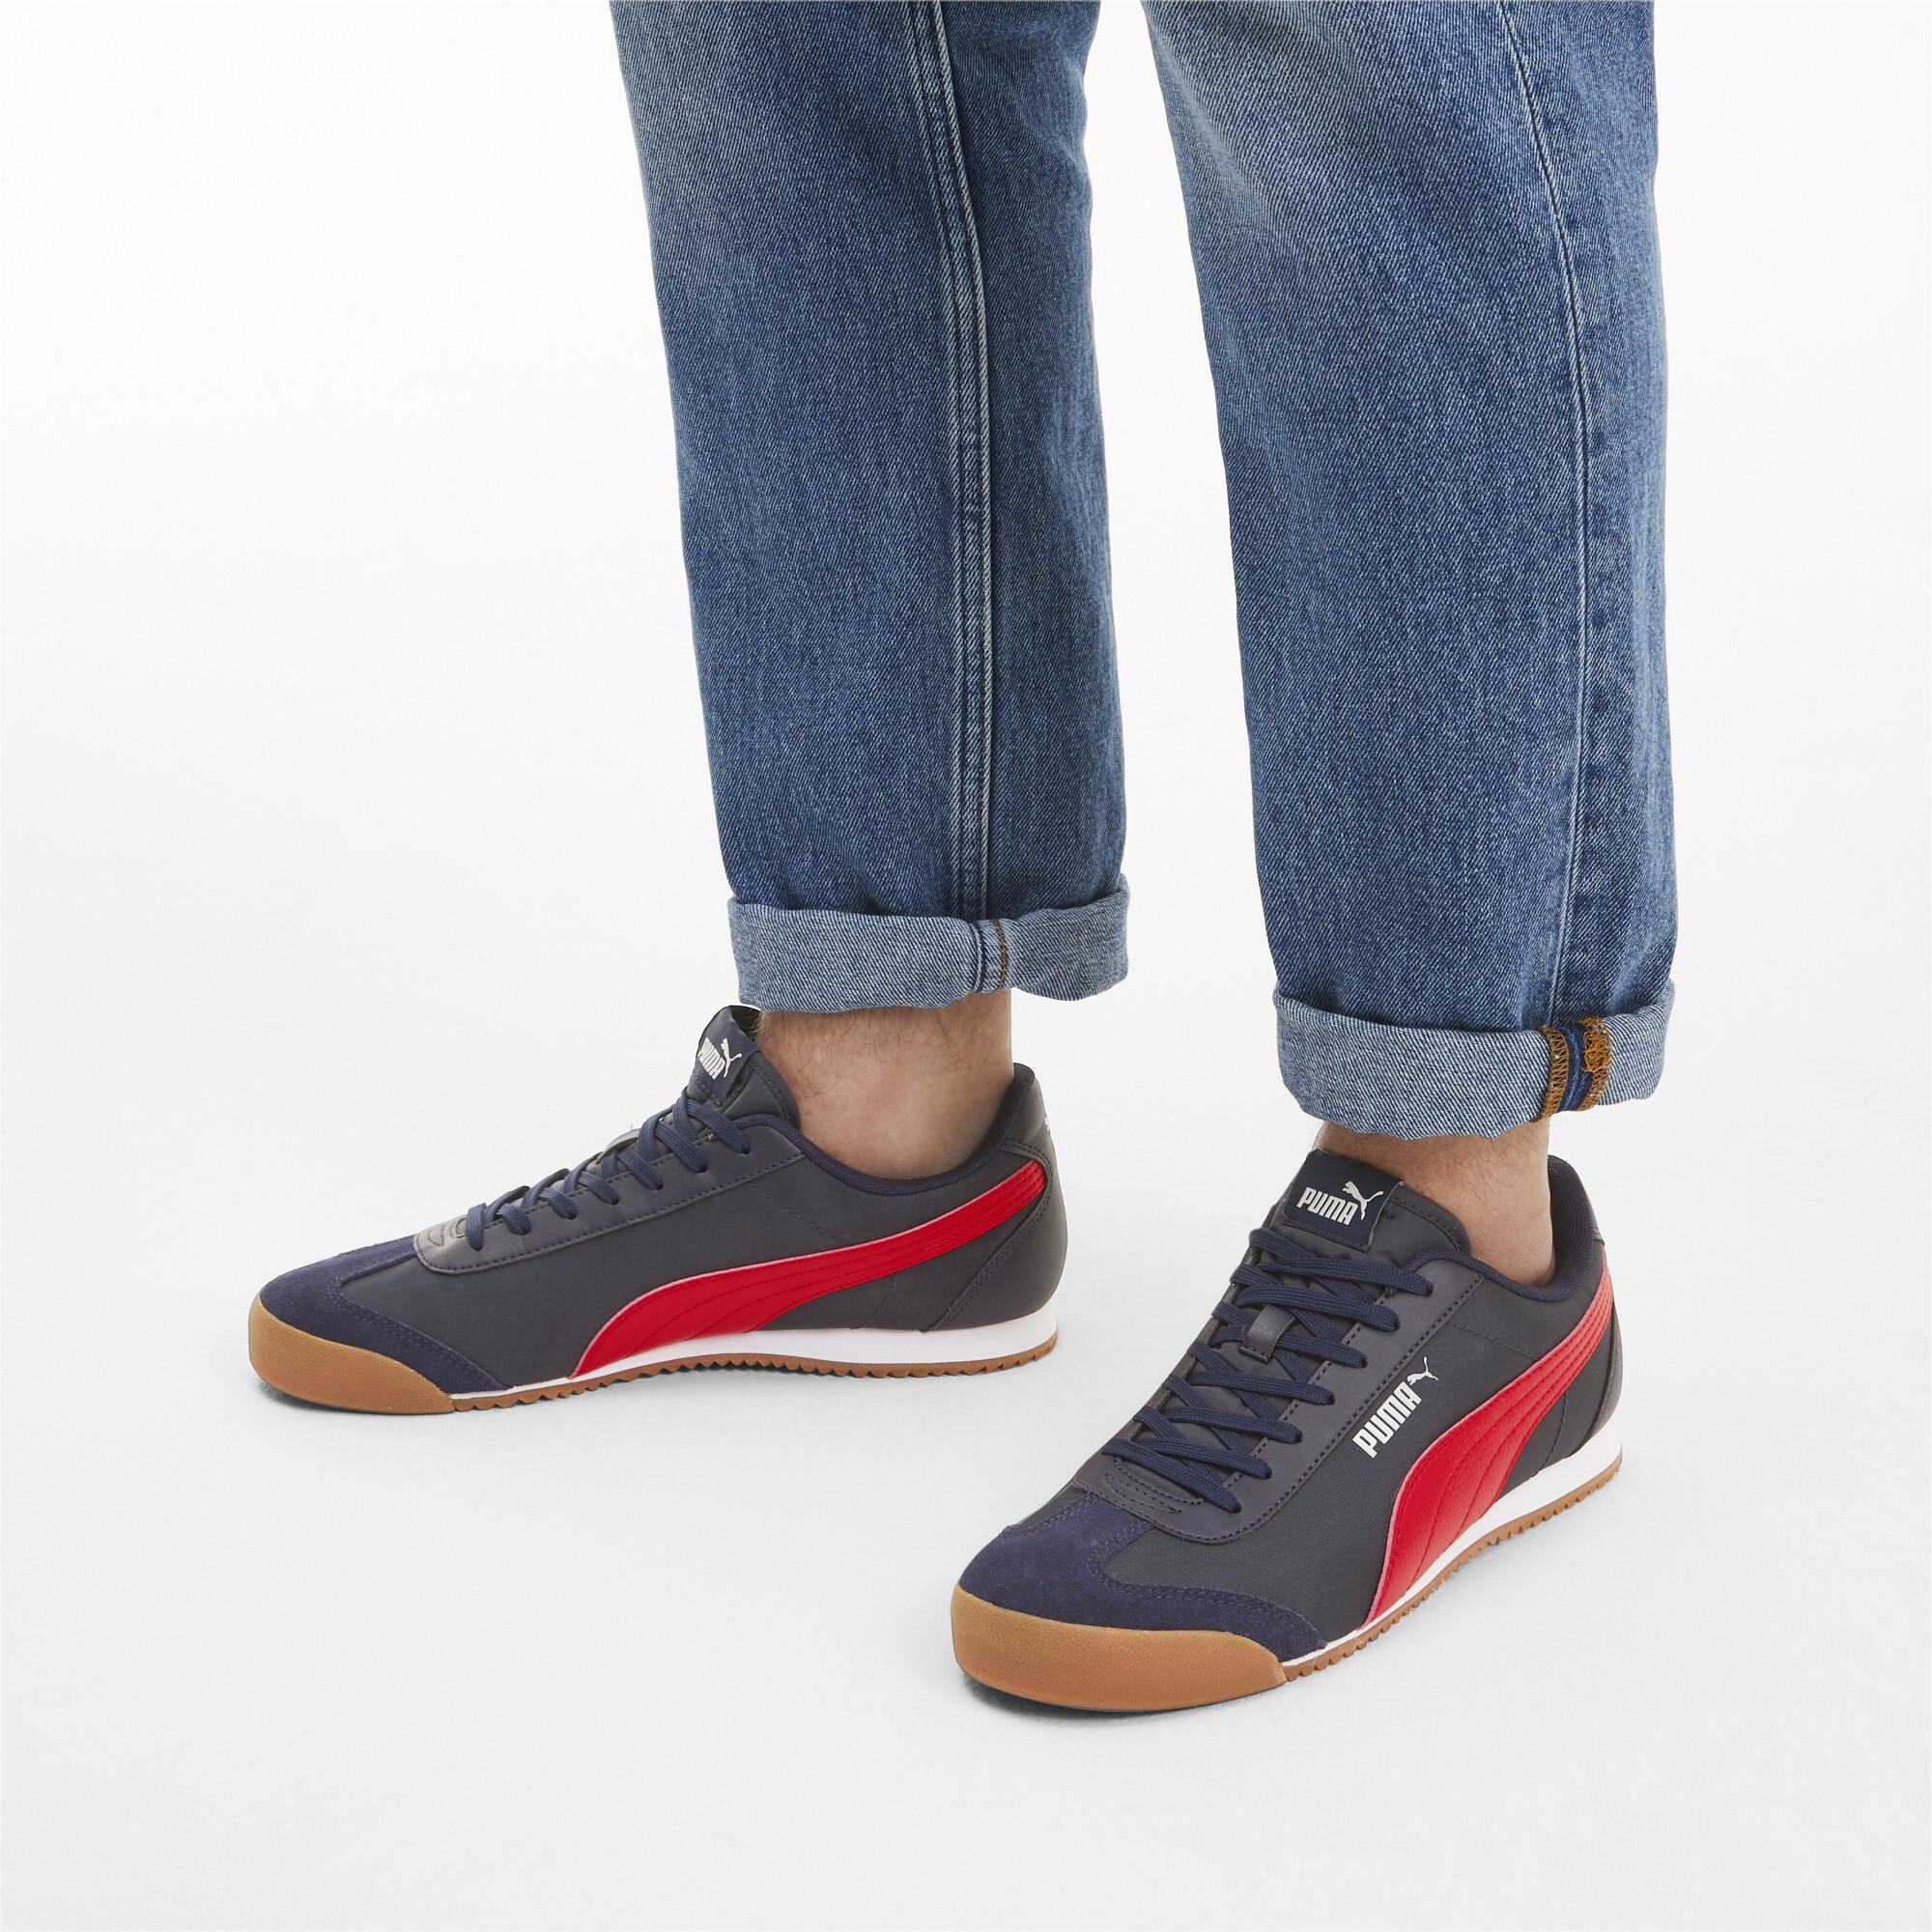 PUMA-Men-039-s-Turino-NL-Sneakers thumbnail 12